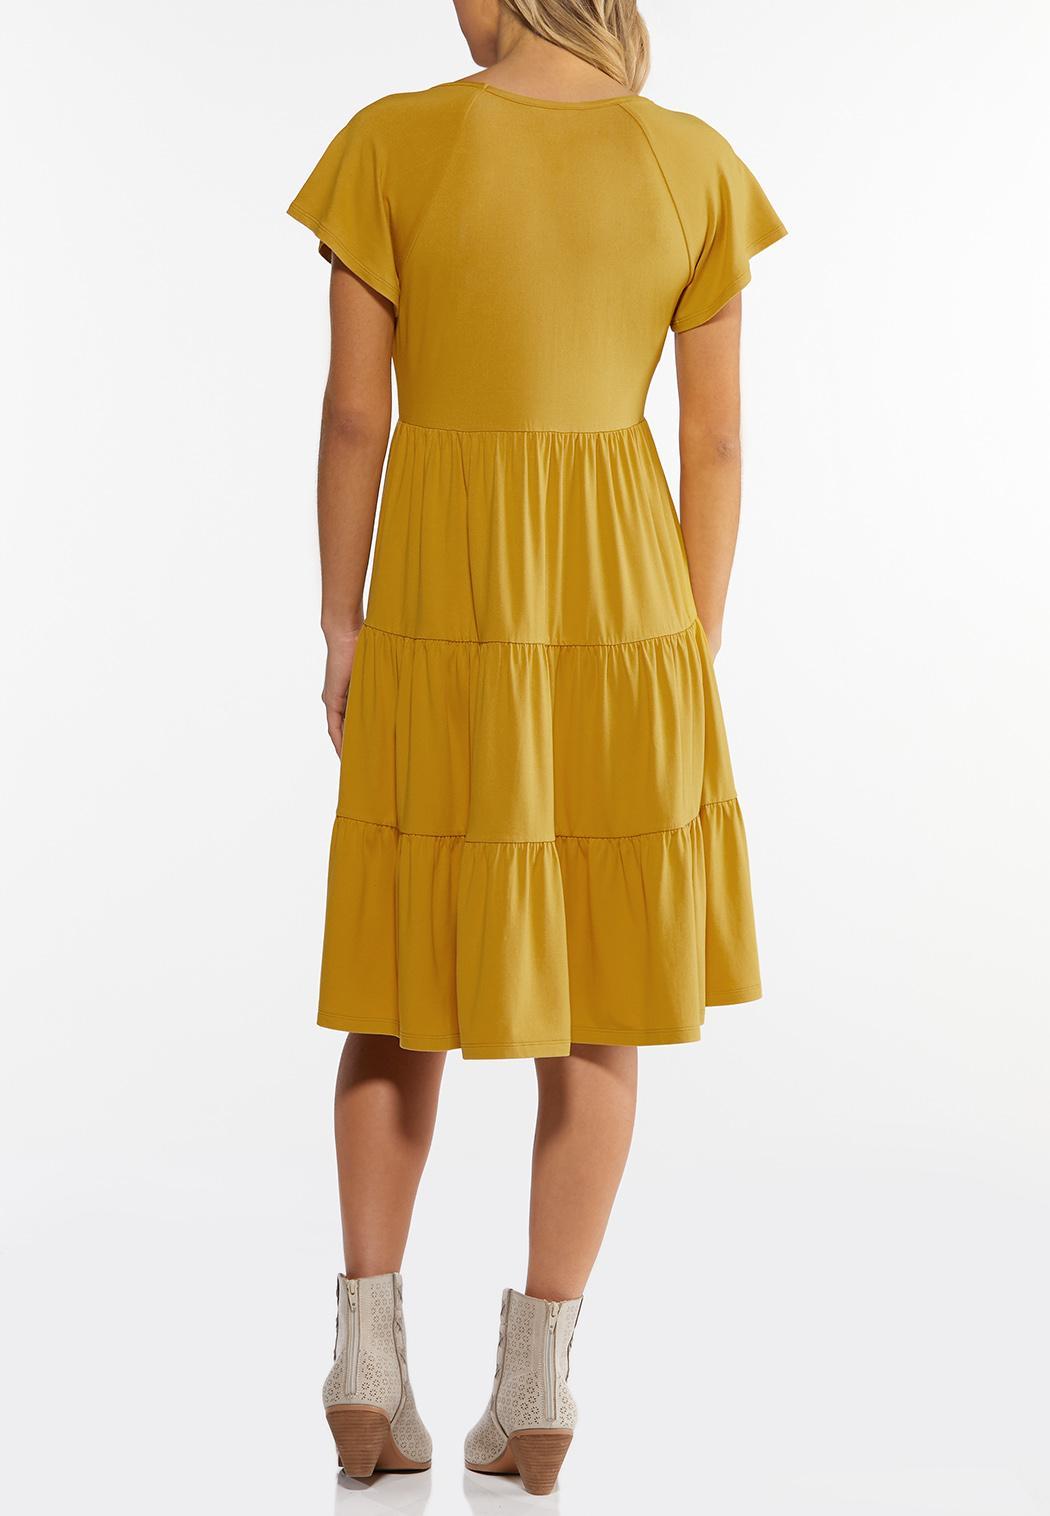 Tiers And Sunshine Dress (Item #44295107)